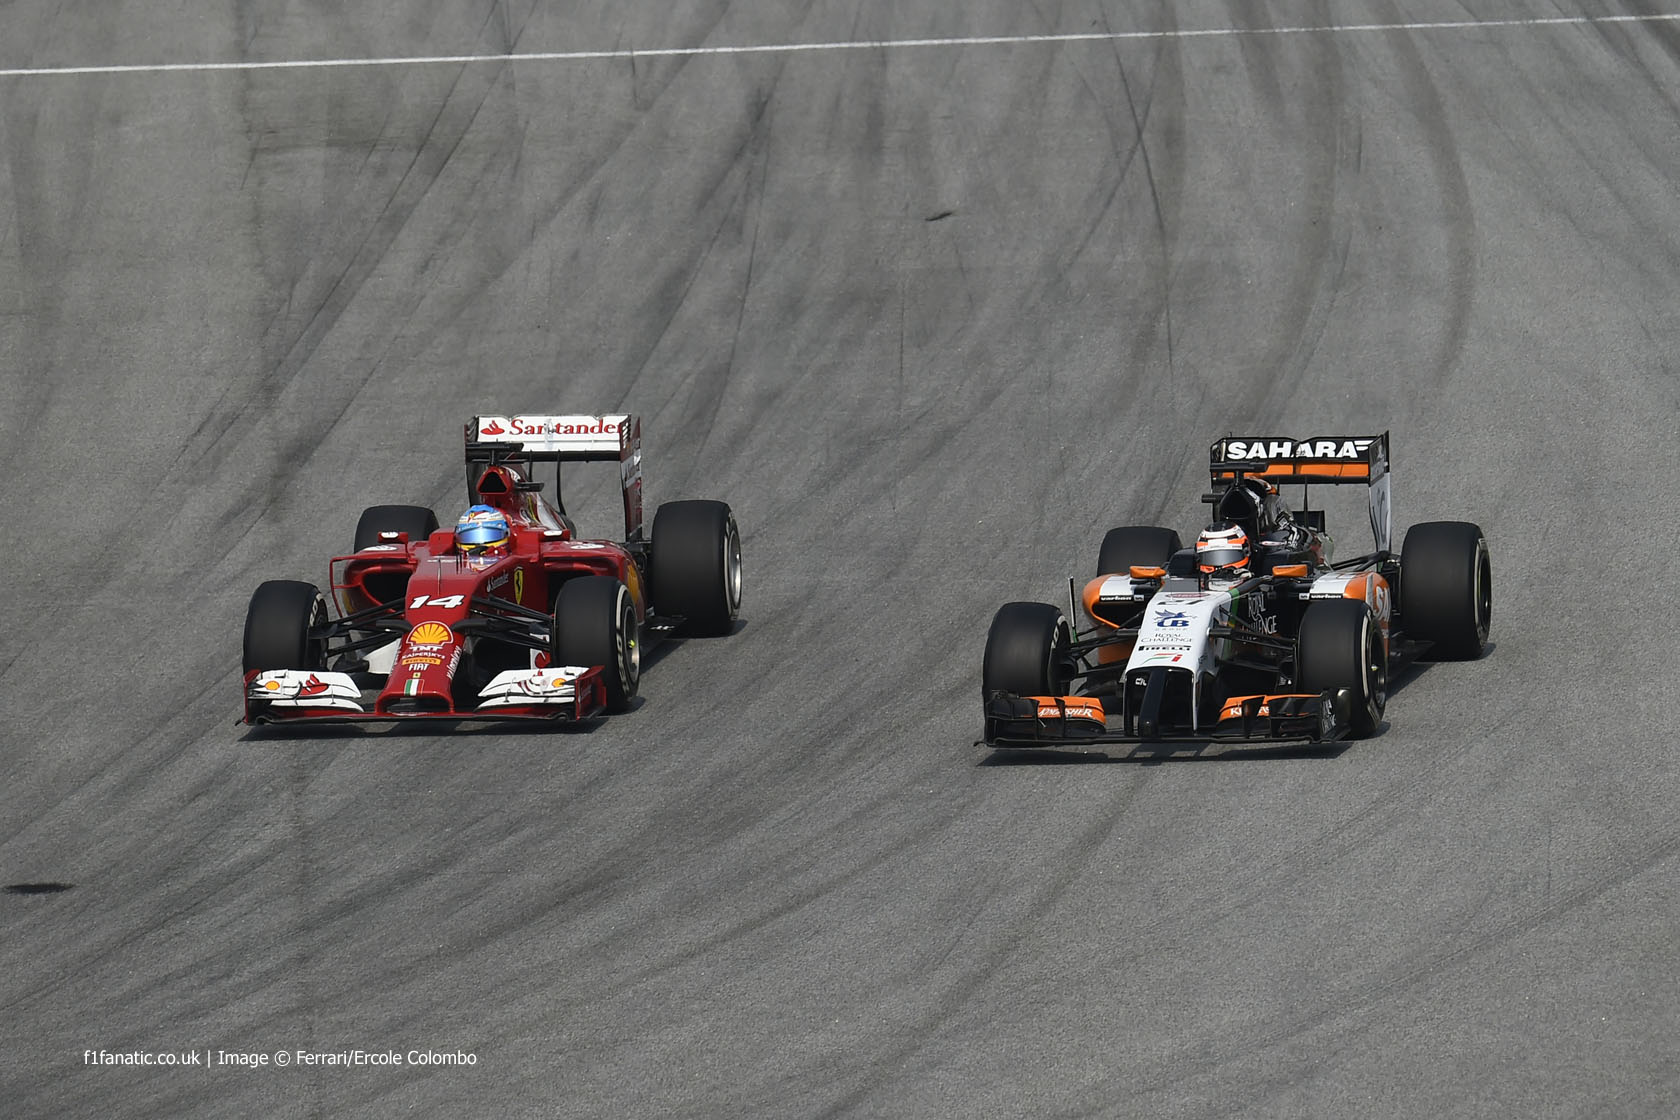 Fernando Alonso, Nico Hulkenberg, Sepang International Circuit, 2014